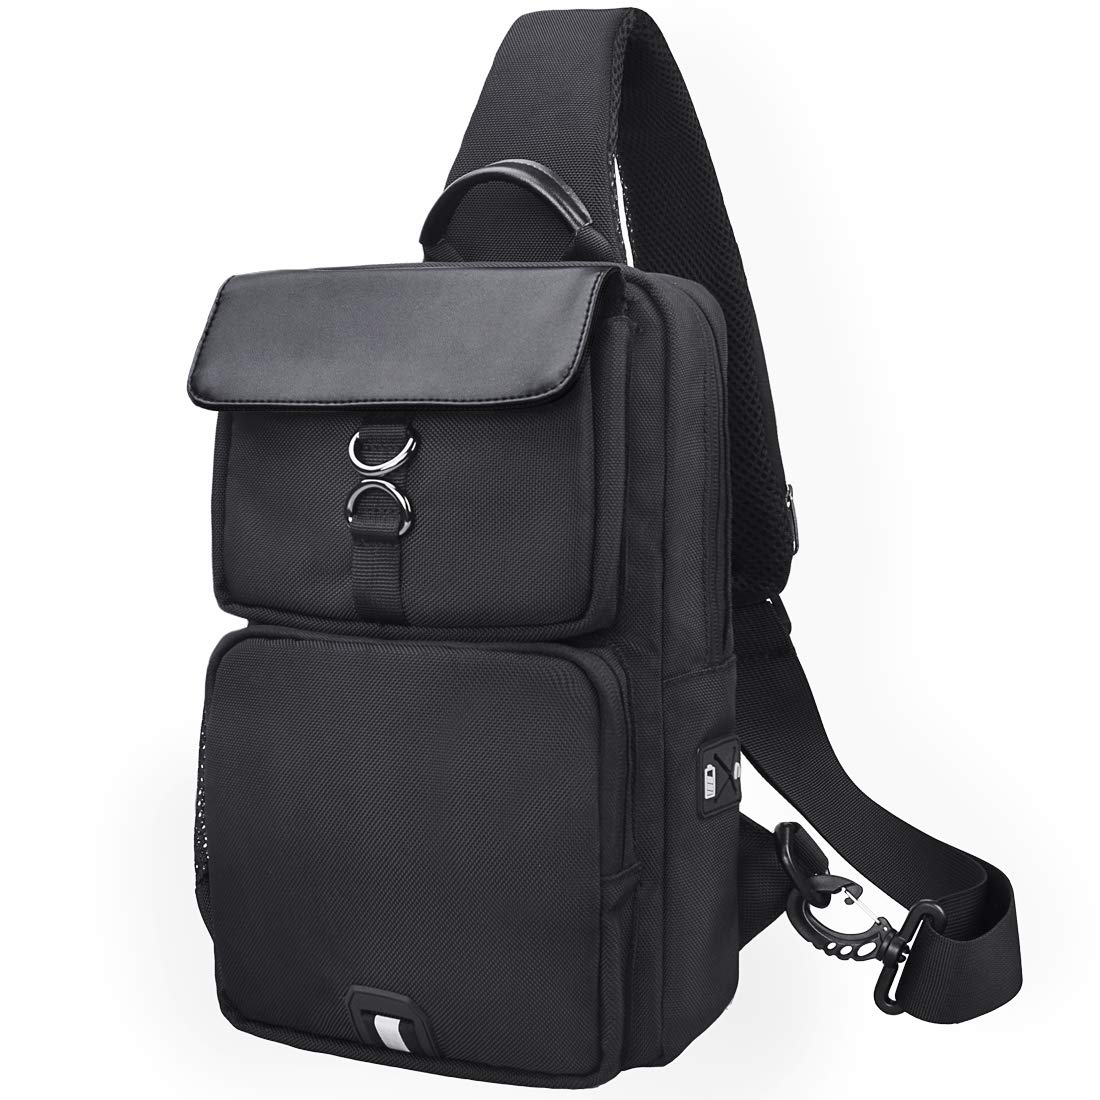 b3385413327d Nubily Sling Bag Chest Shoulder Backpack USB Earphone Crossbody Bag  Lightweight Sport Hiking Travel Camping Gym Daypack Men Women